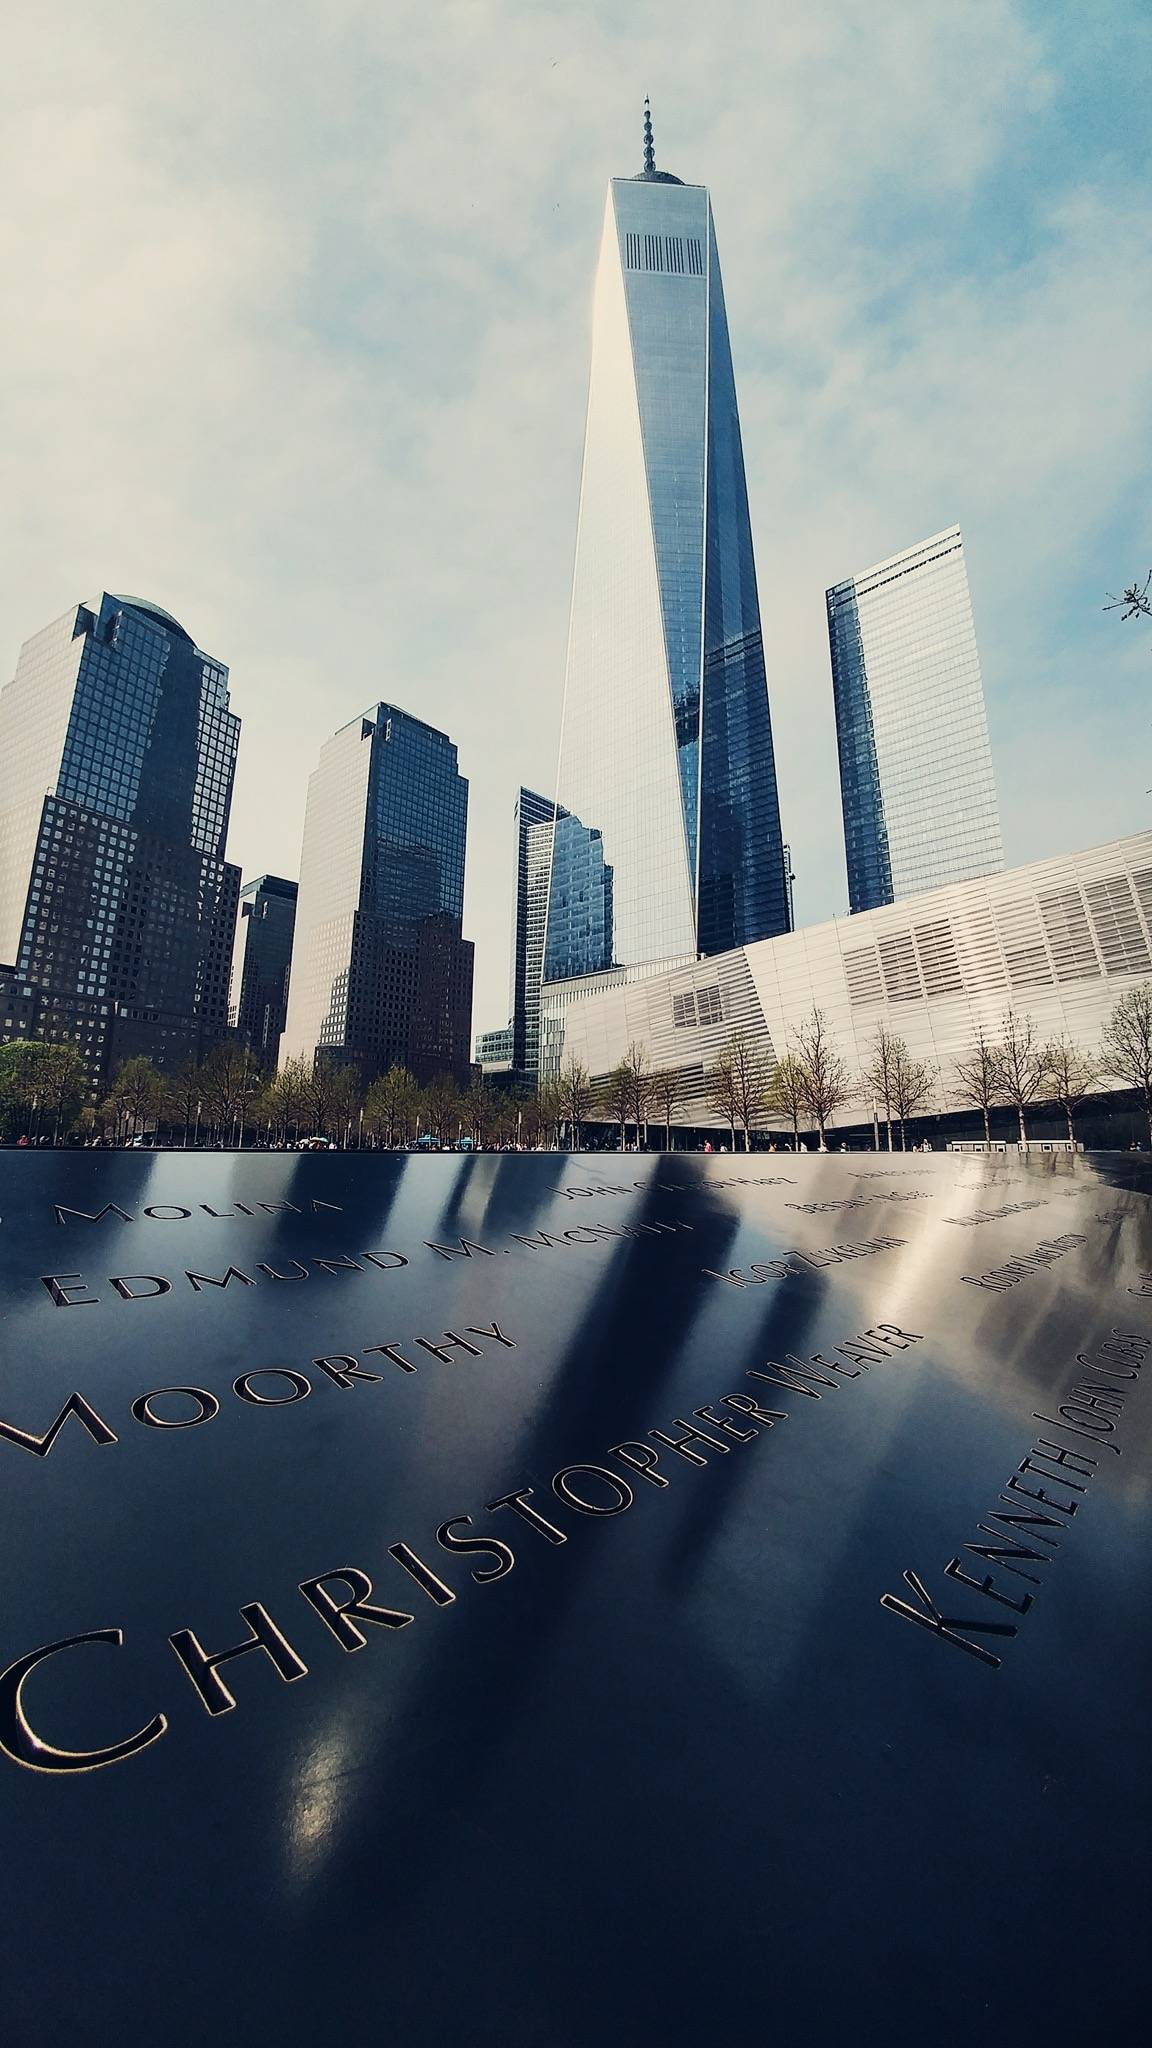 Photo 1: National September 11 Memorial & Museum